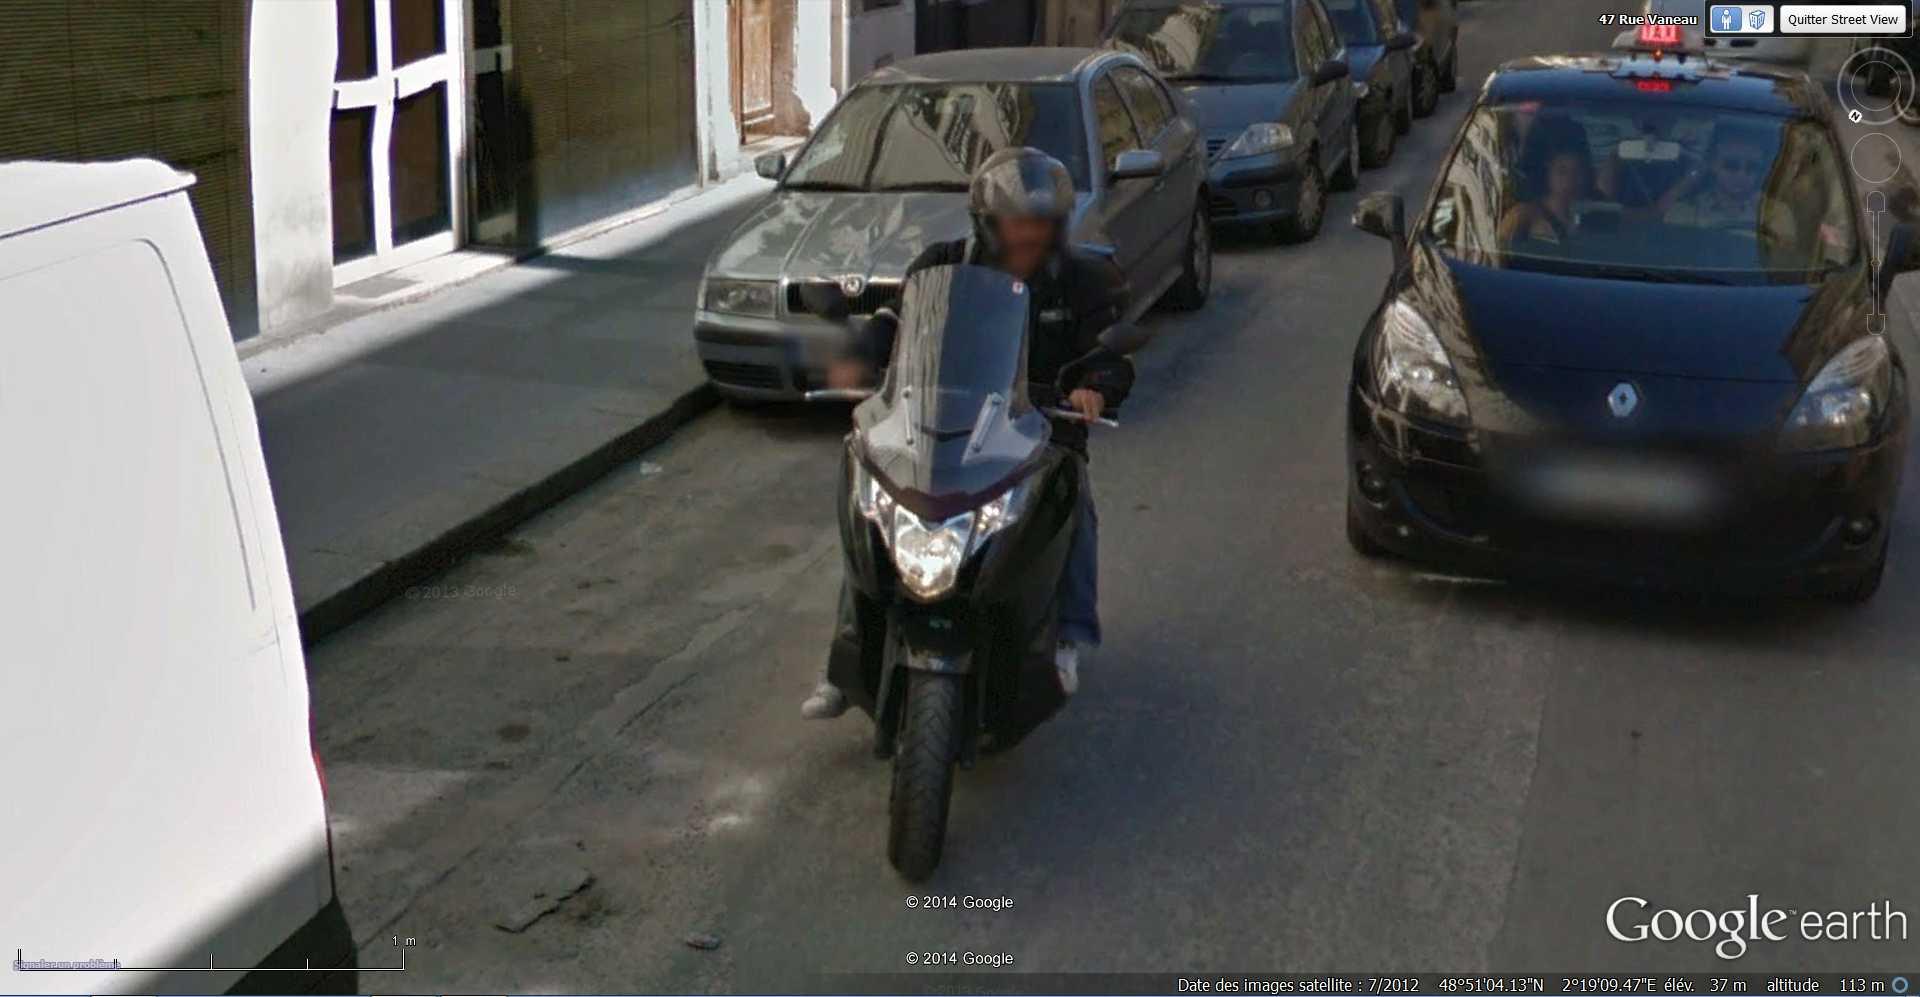 STREET VIEW : Chute de moto - rue Vaneau - Paris - France  2014-314